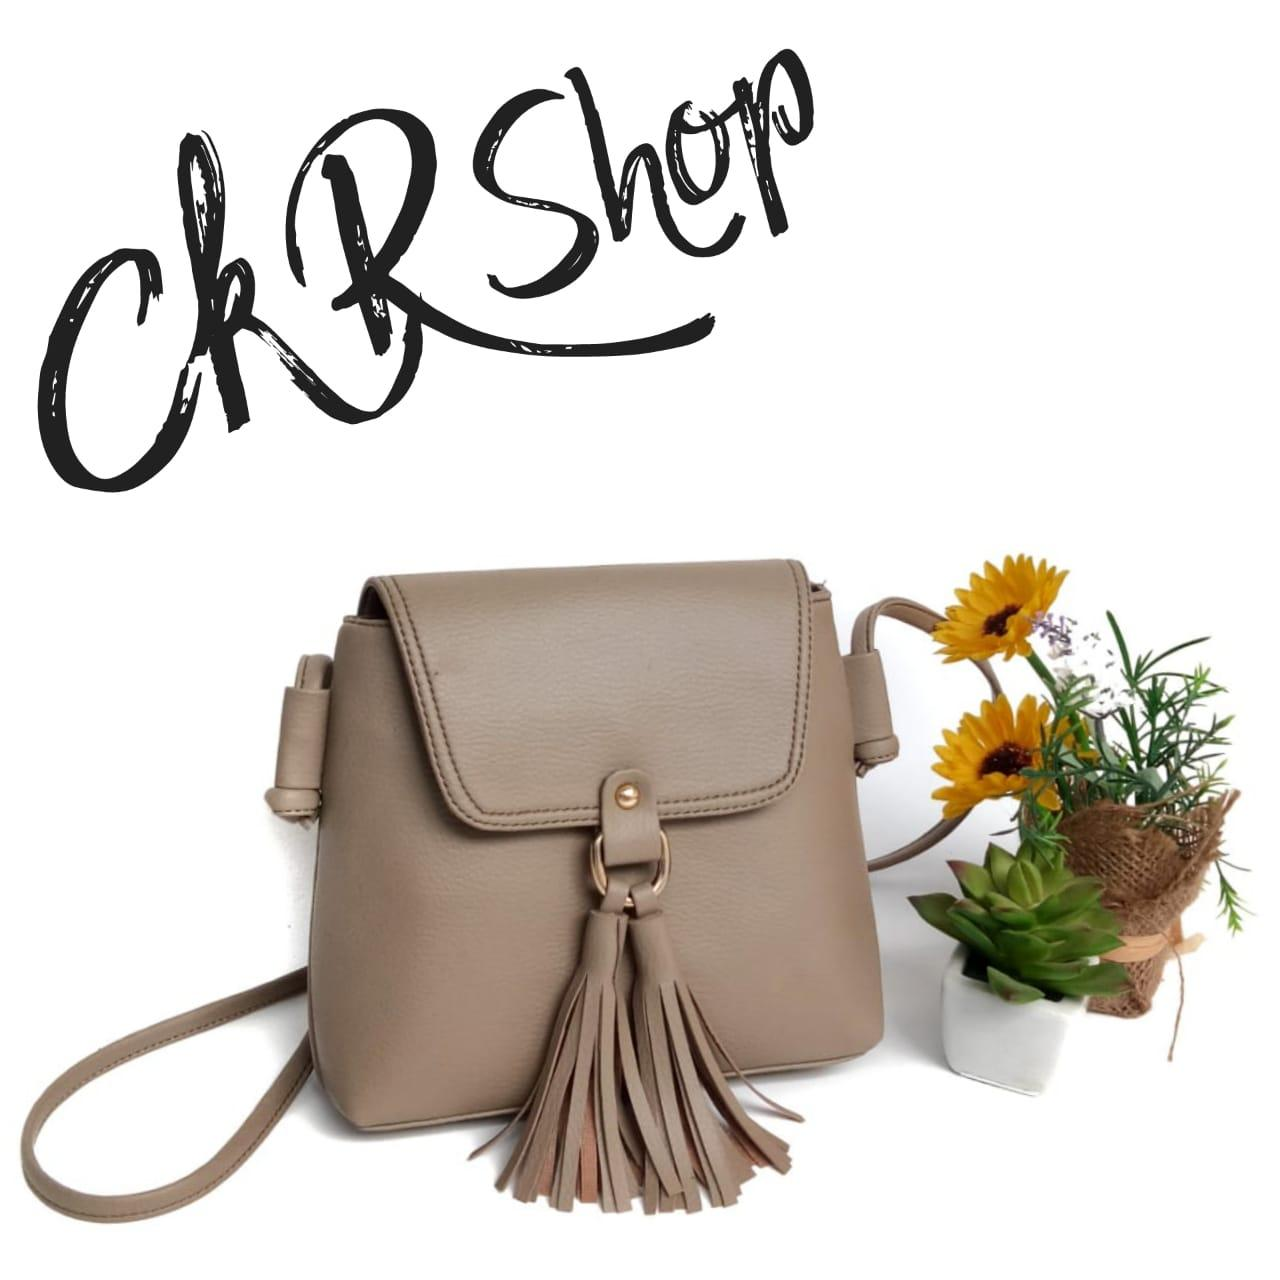 CKR Shop - Khalisa Tas Wanita Tas Selempang Sling Bag